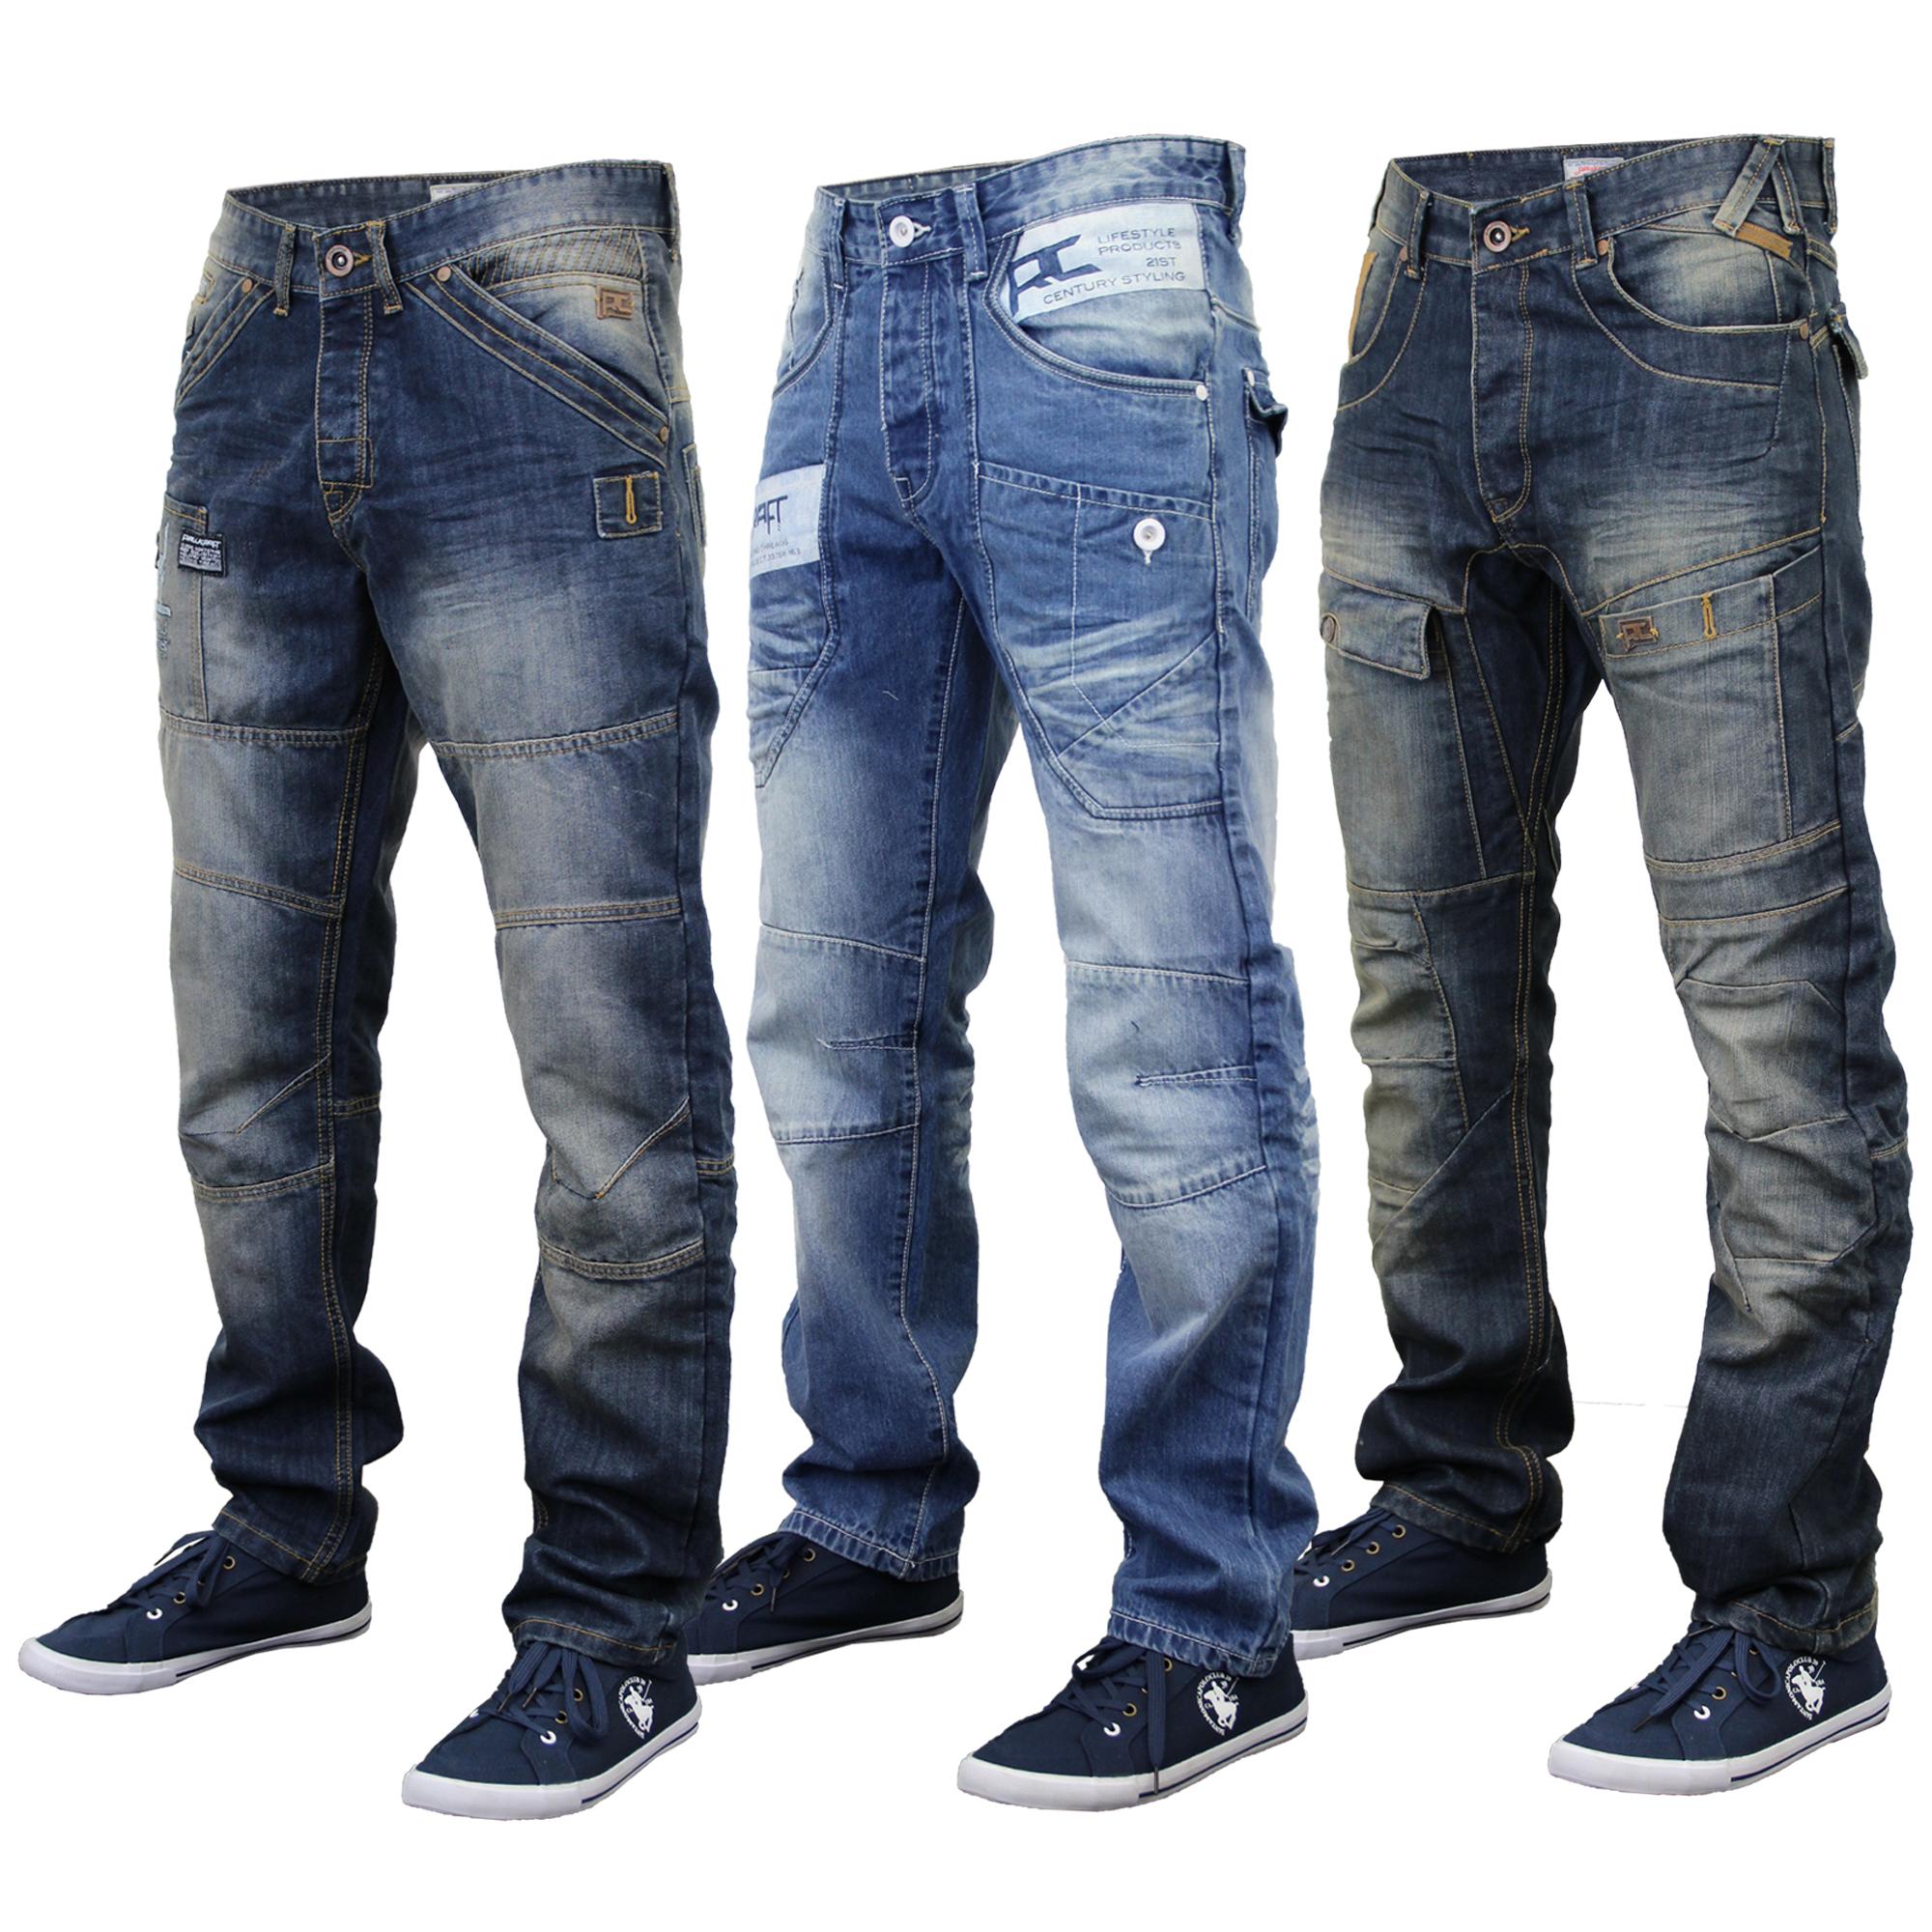 mens jeans mens-jeans-rawcraft-denim-tapered-straight-leg-bottom- IIBADPU